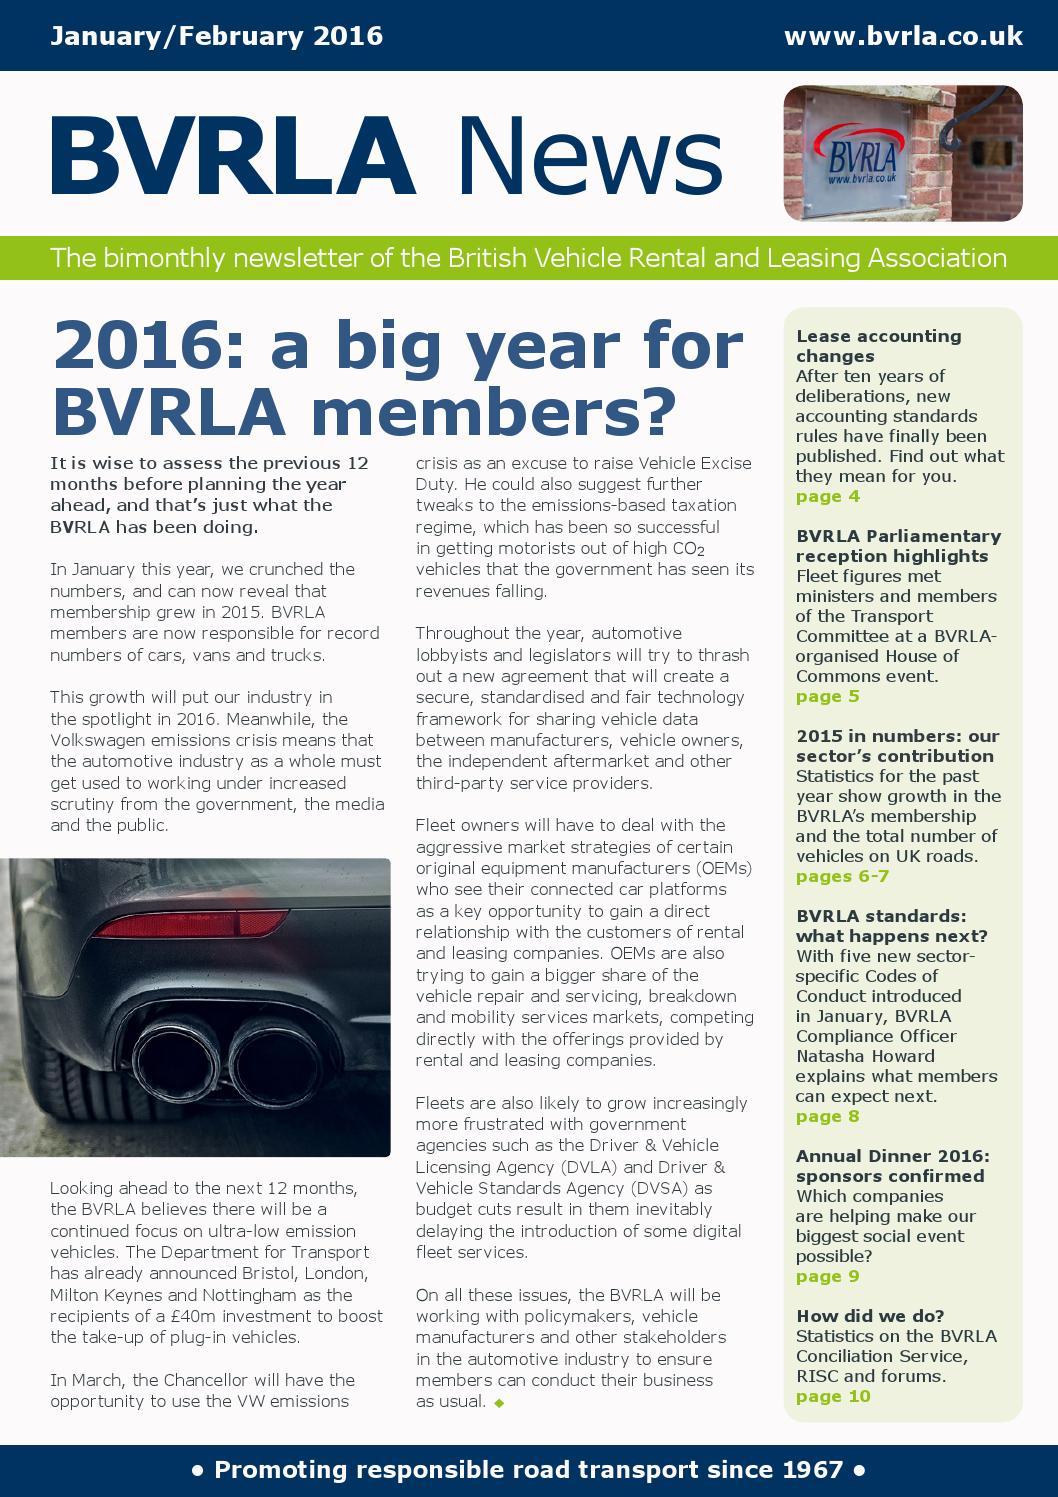 BVRLA News, January/February 2016 by BVRLA - issuu